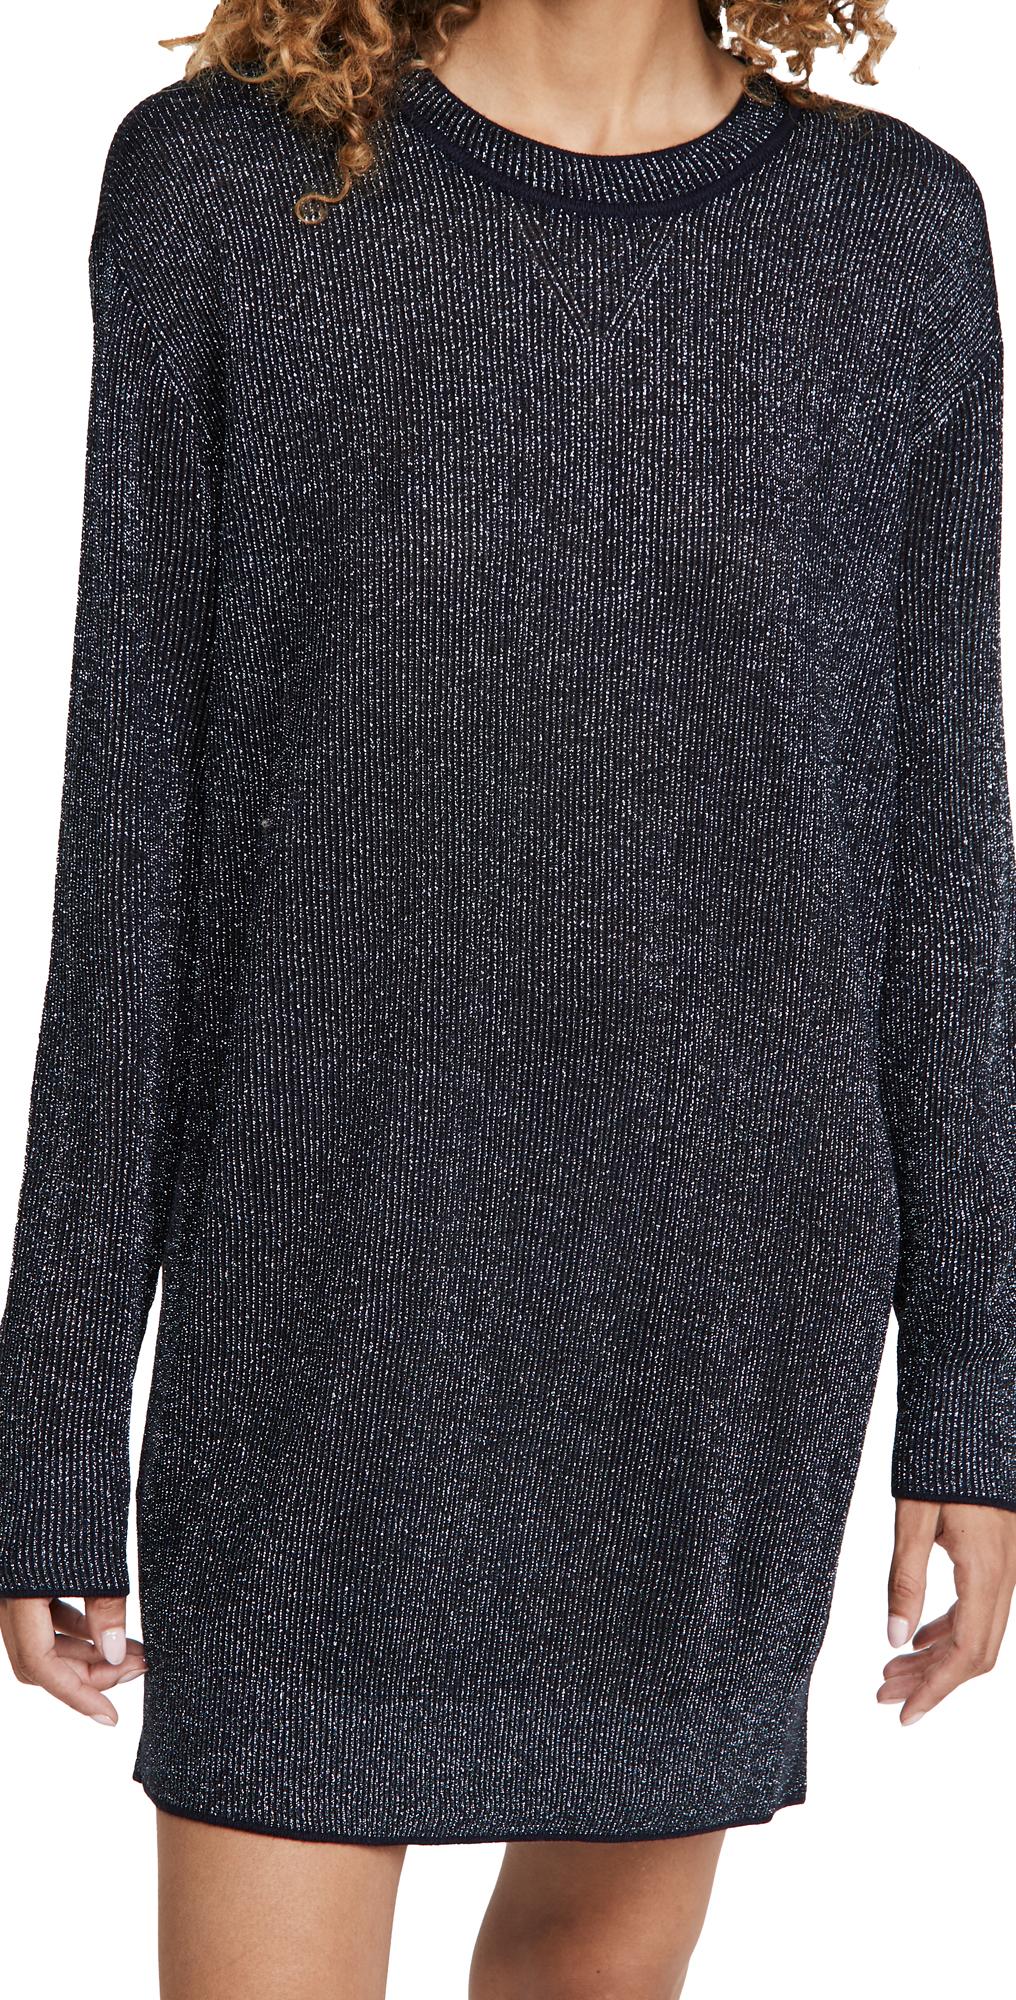 Rag & Bone Cherie Mini Sweater Dress